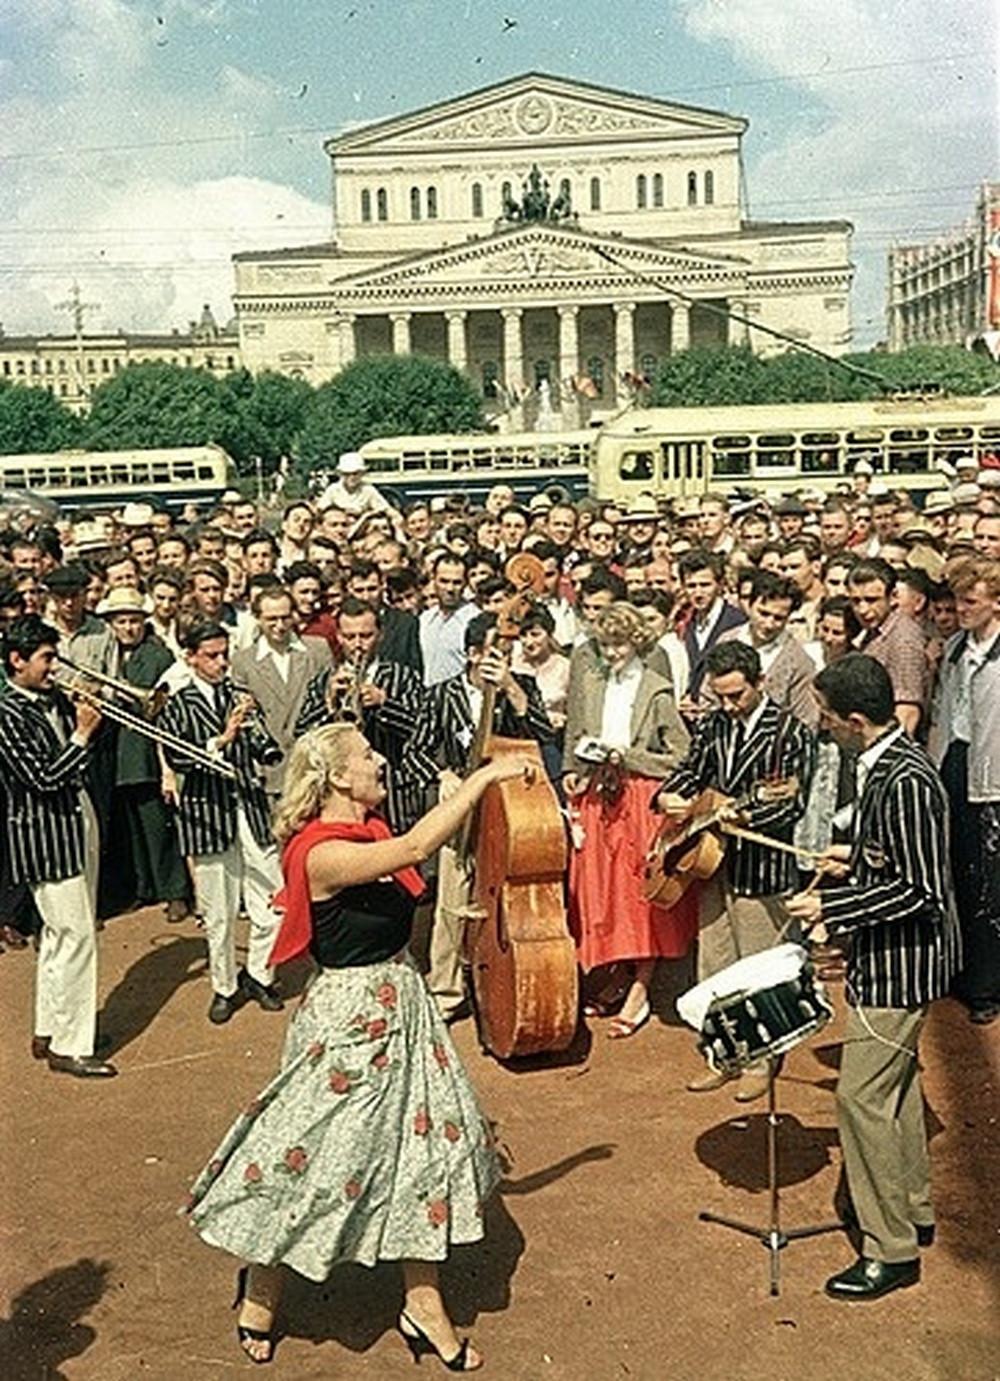 festival molodezhi studentov Moskva 1957.jpg 14